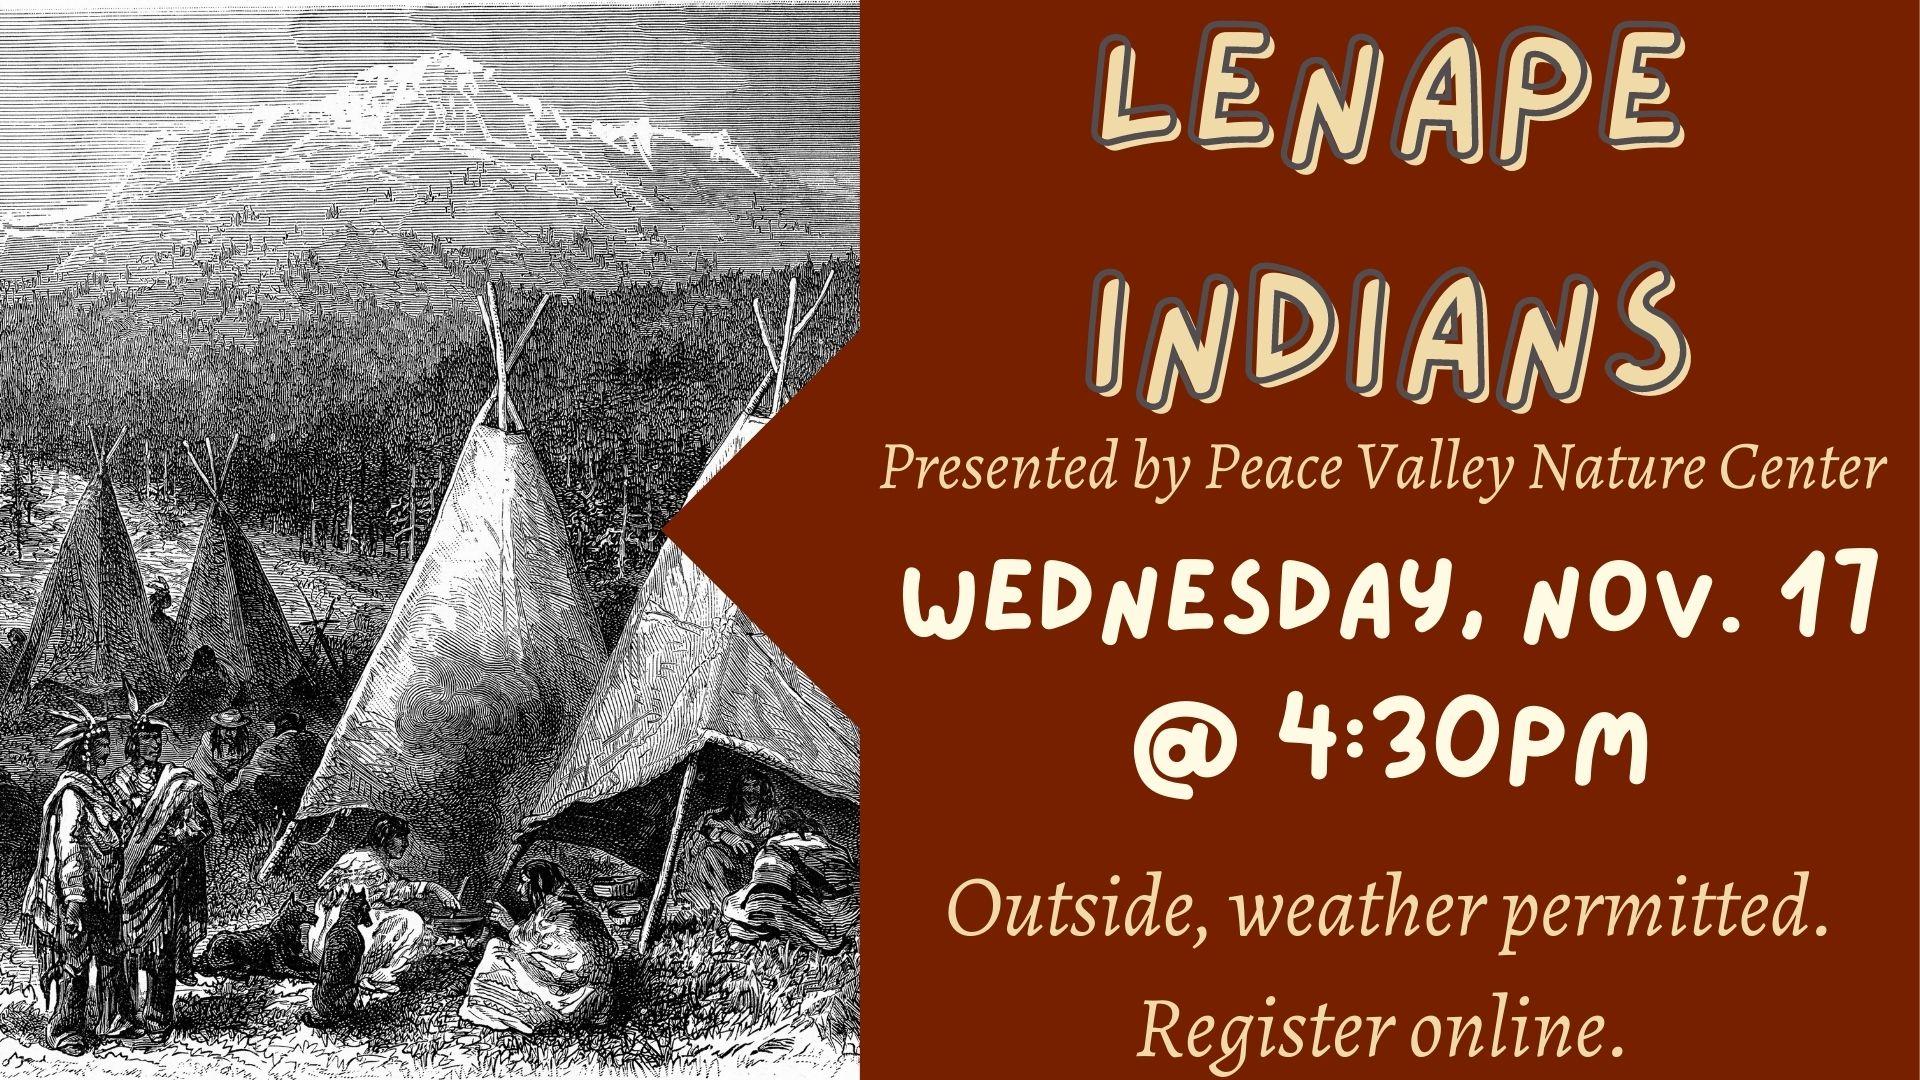 Peace Valley Nature Center: Lenape Indians